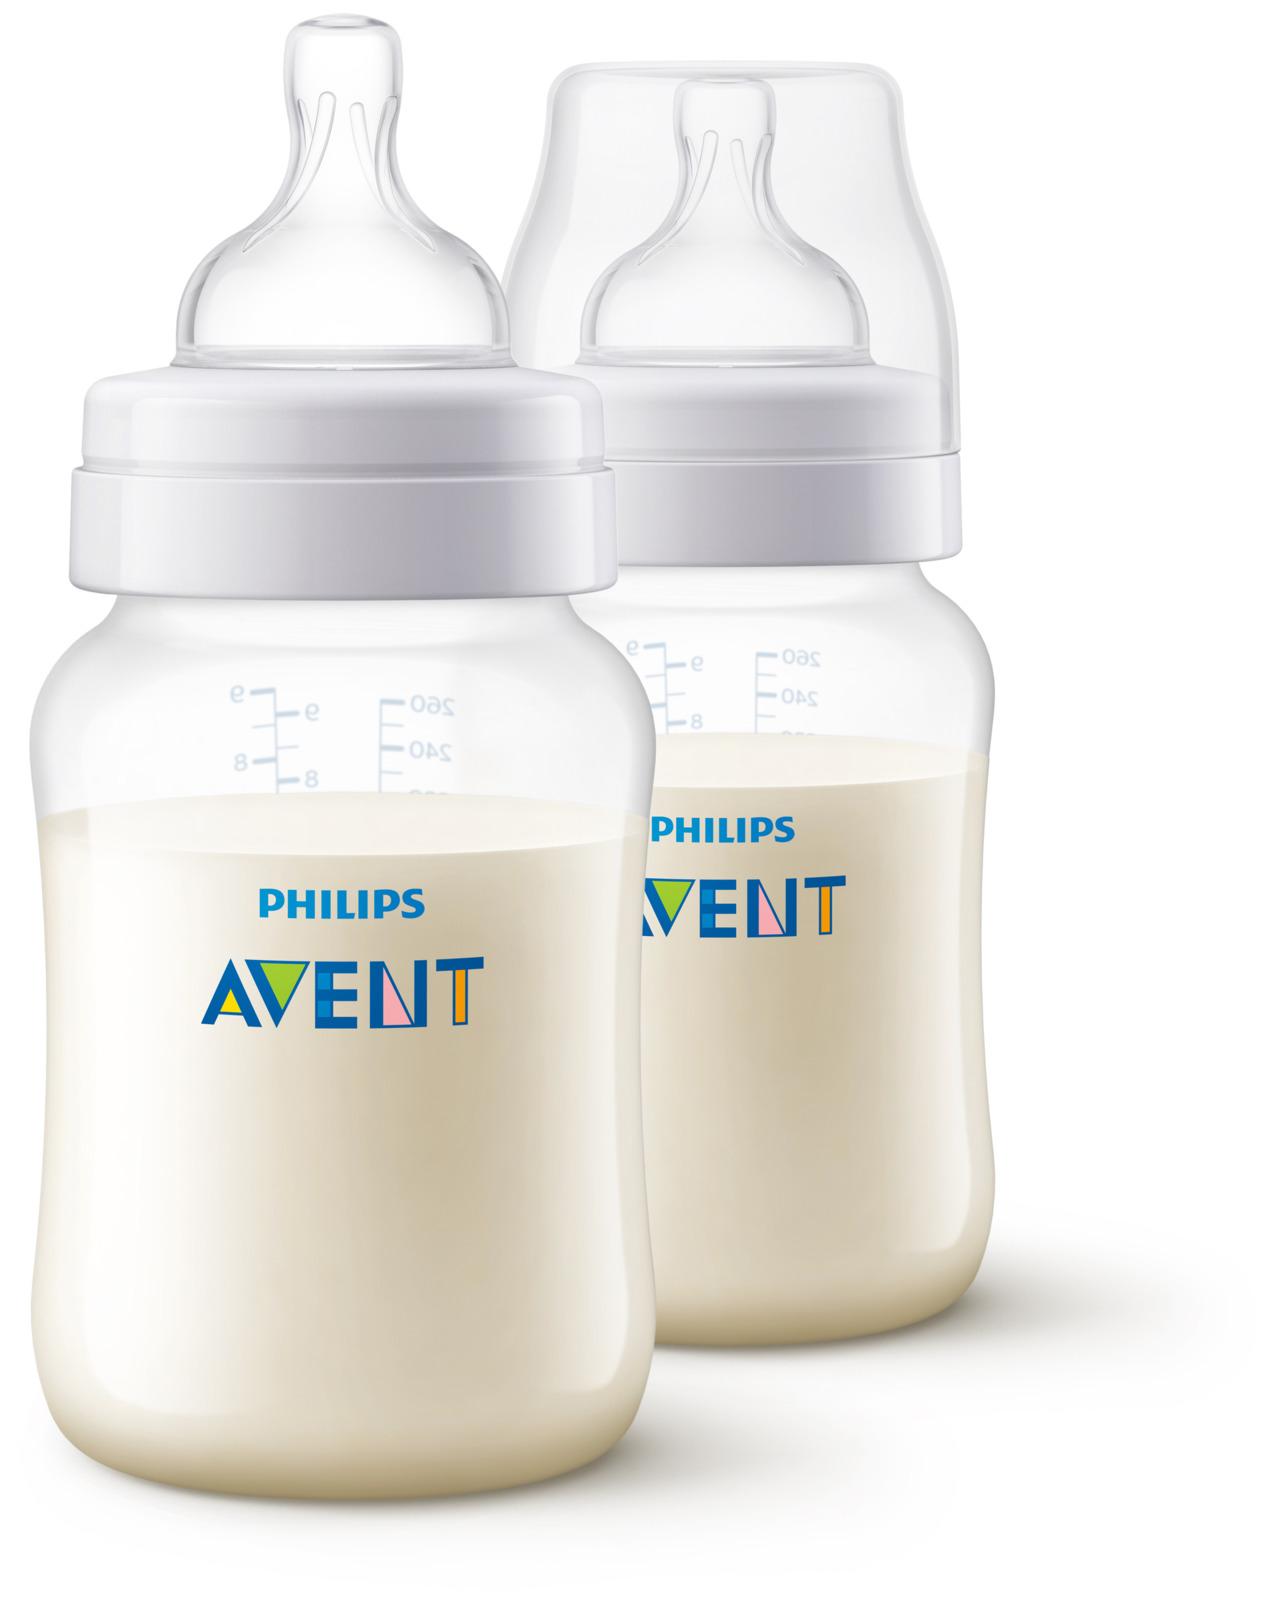 Бутылочка для кормления Philips Avent Anti-colic, от 1 месяца, SCF813/27, 260 мл, 2 шт телевизор philips 32pht4132 60